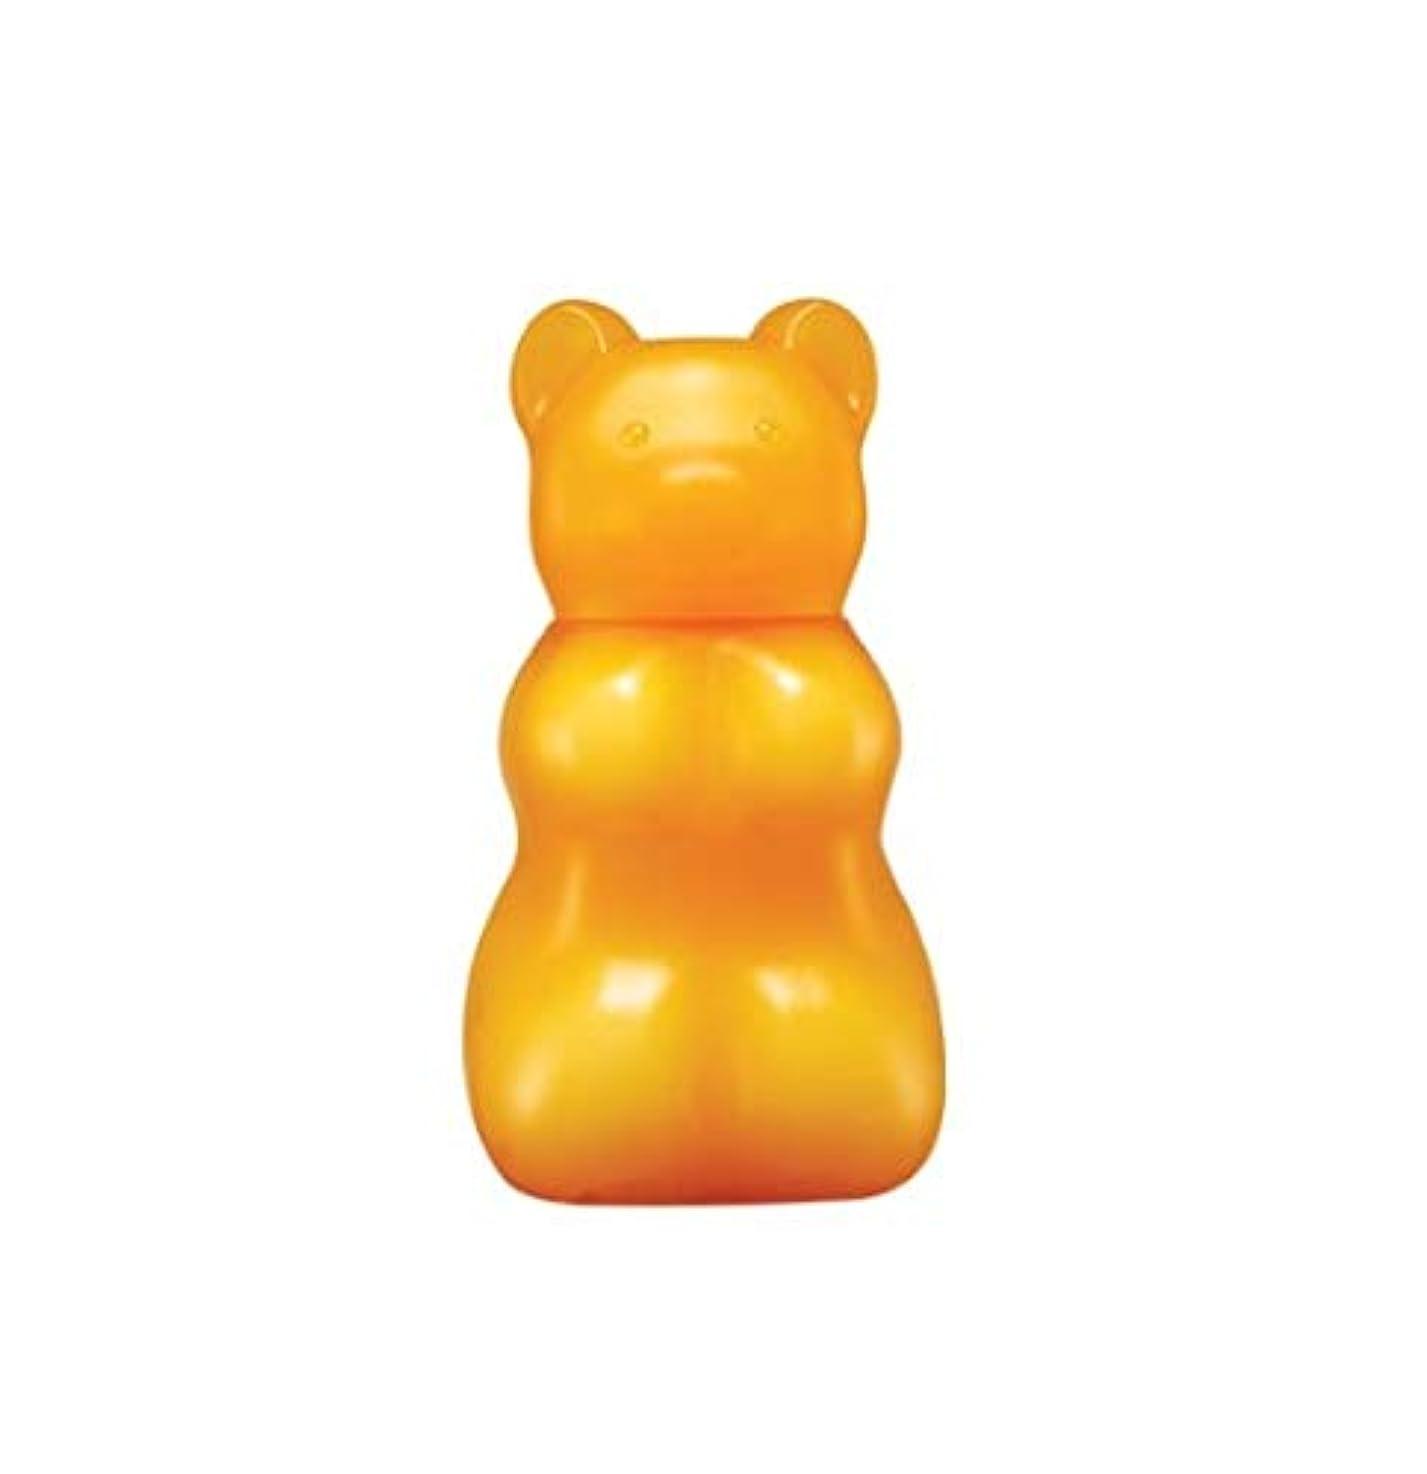 Skinfood グミベアゼリークリーンジェル(アップル)#オレンジ(ハンドクリーム) / Gummy Bear Jelly Clean Gel (Apple) #Orange (Hand Cream) 45ml [並行輸入品]